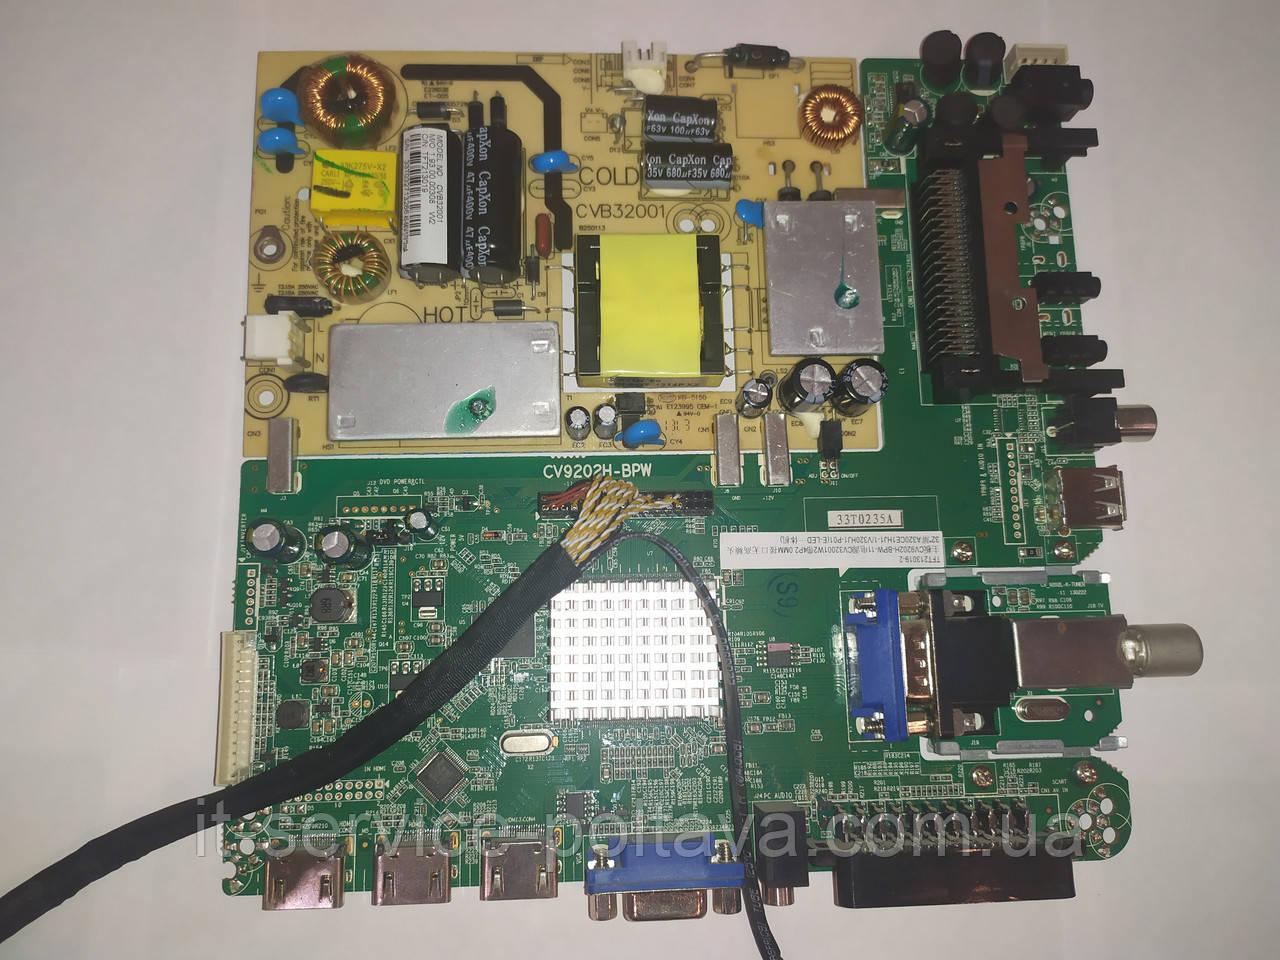 Материнська плата (Main Board) CV9202H-BPW (CVB32001)